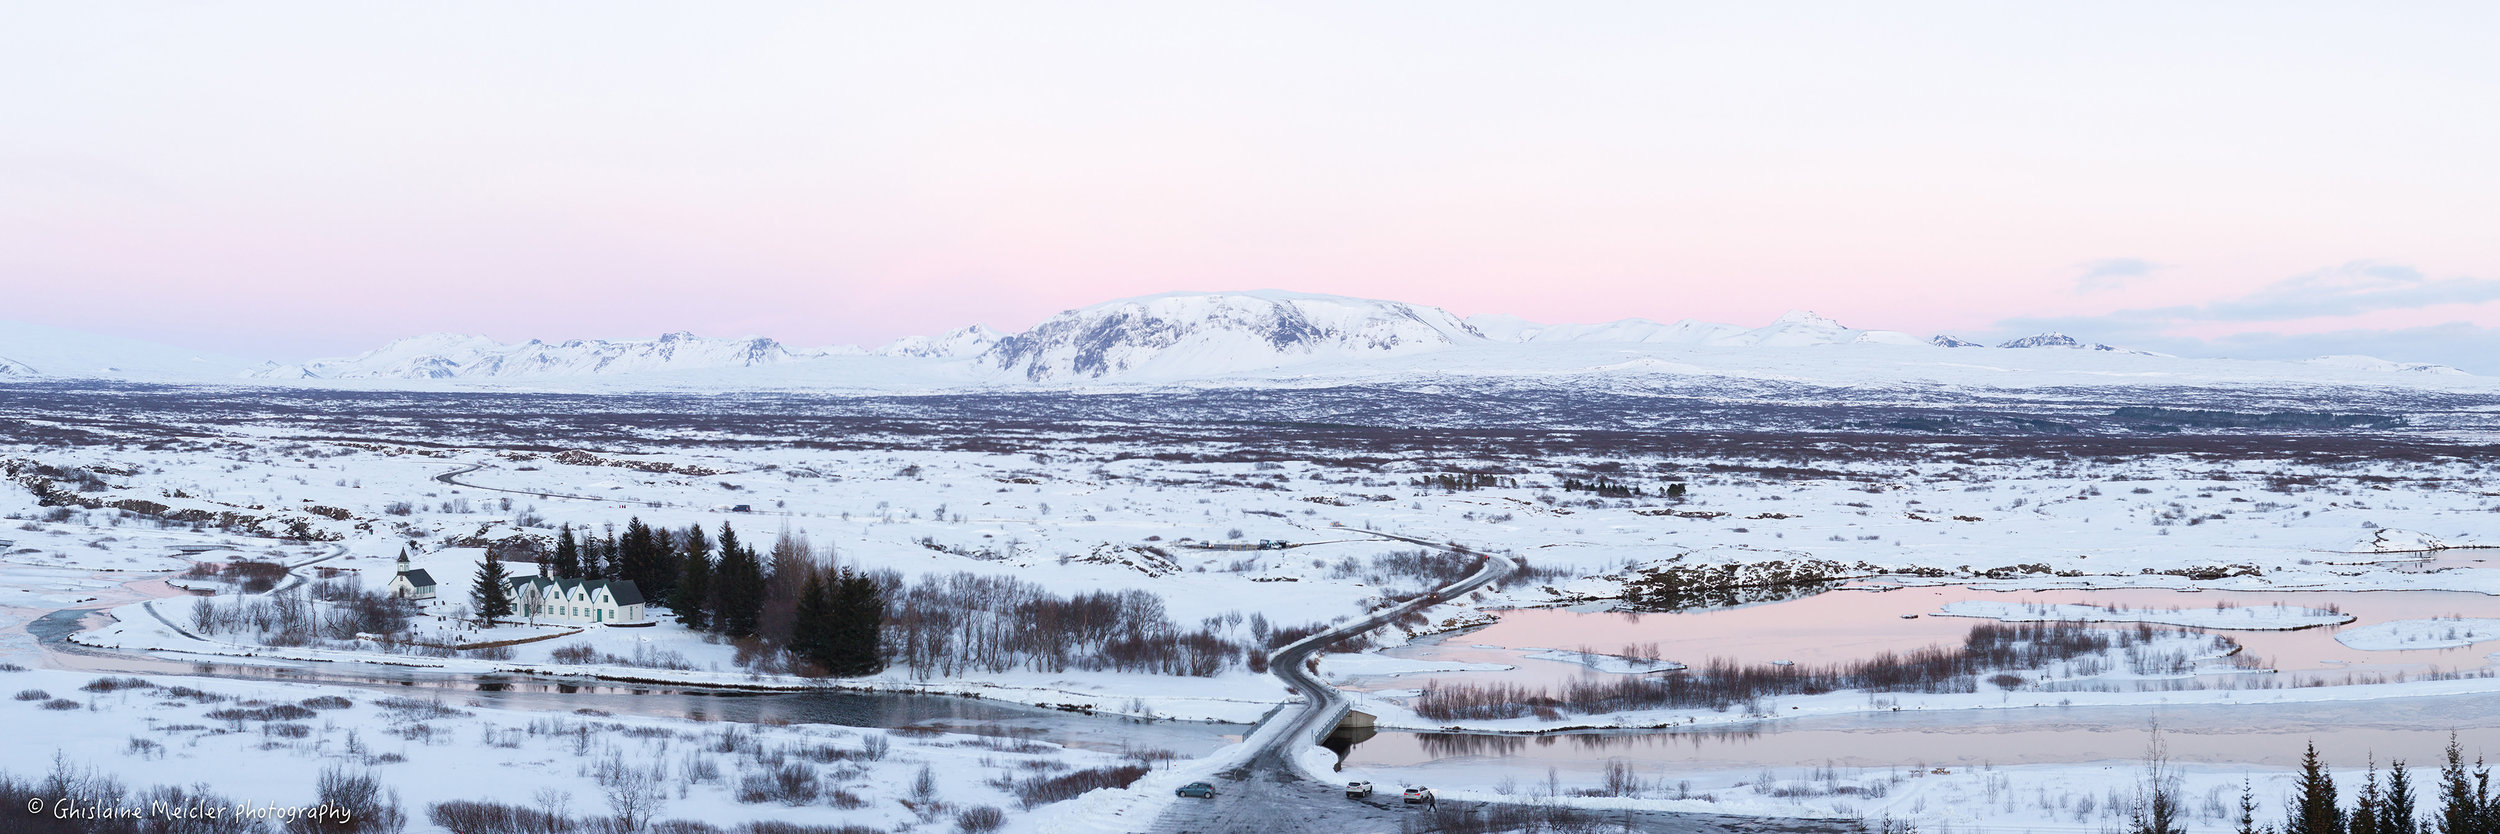 Islande-79.jpg